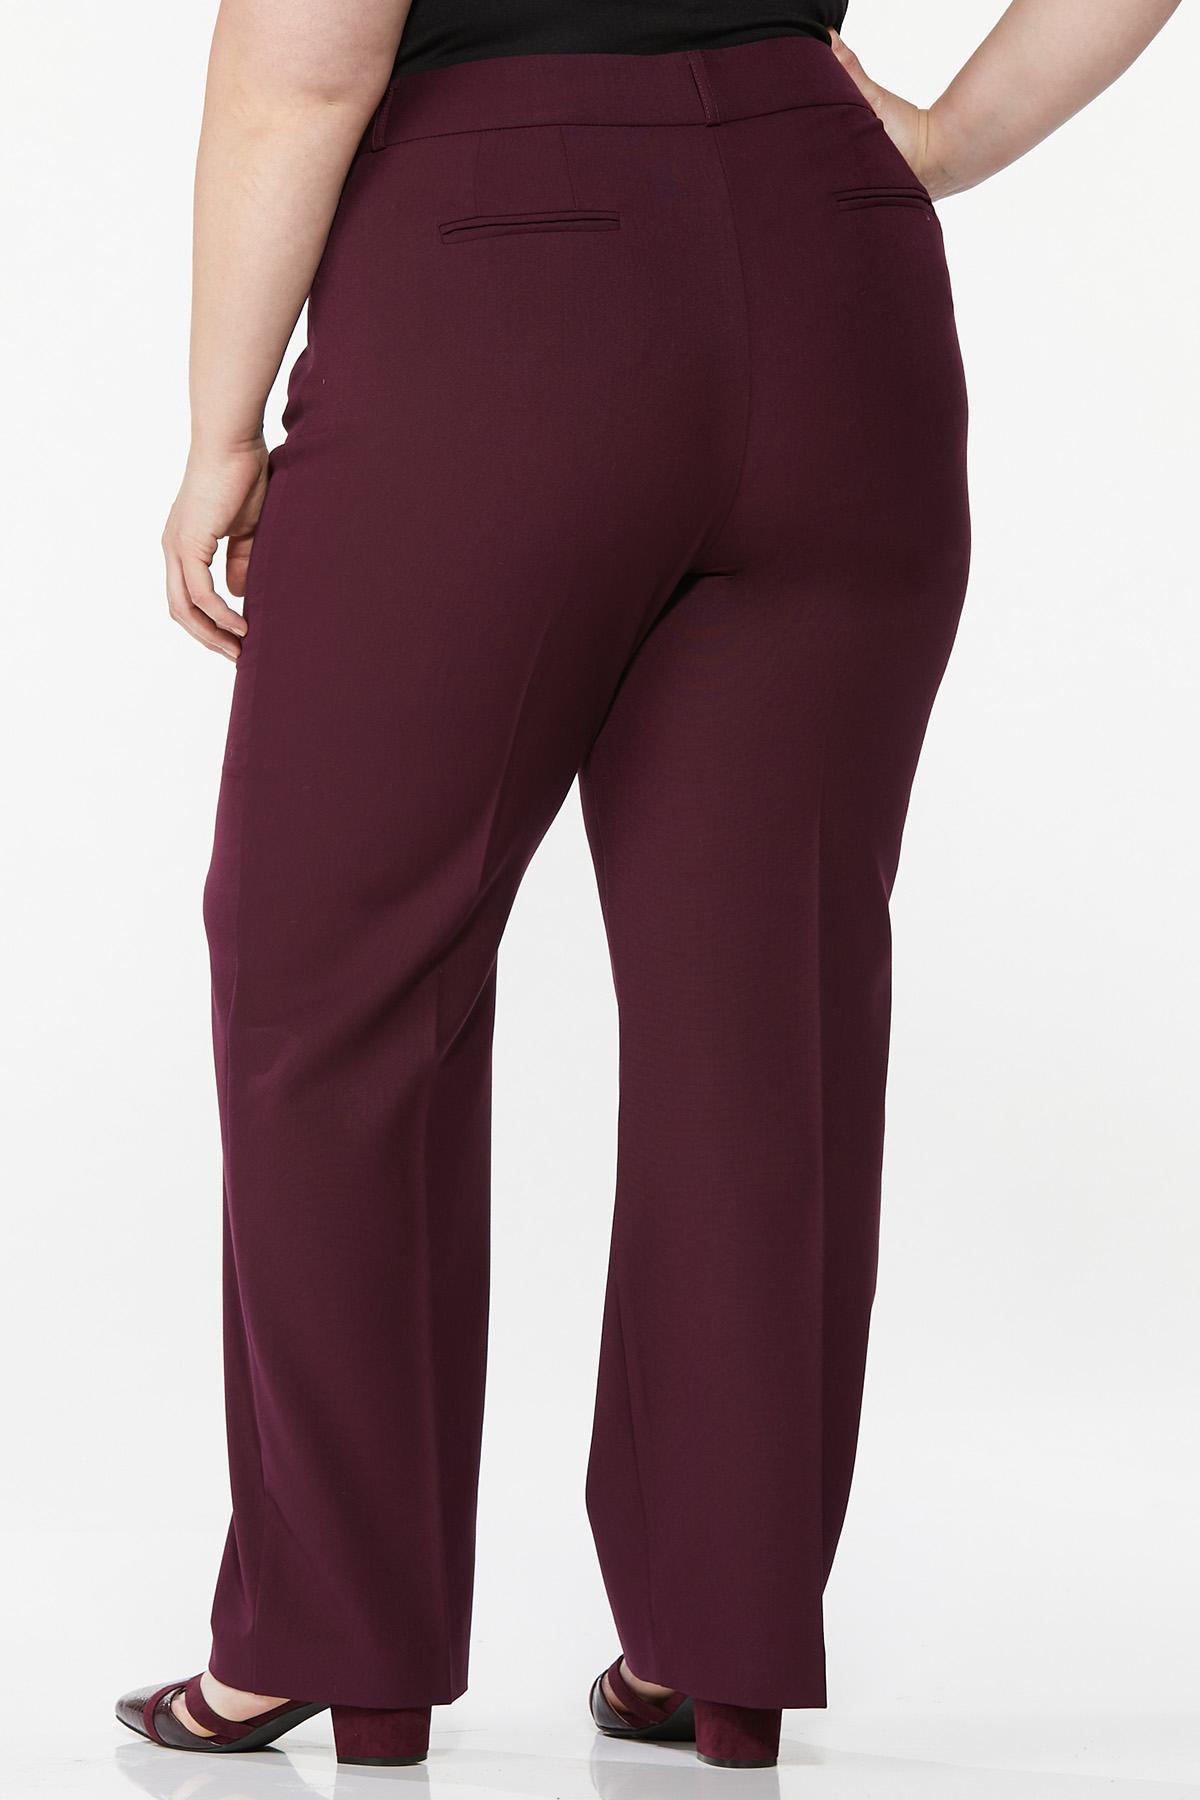 Plus Petite Curvy Wine Trousers (Item #44719445)